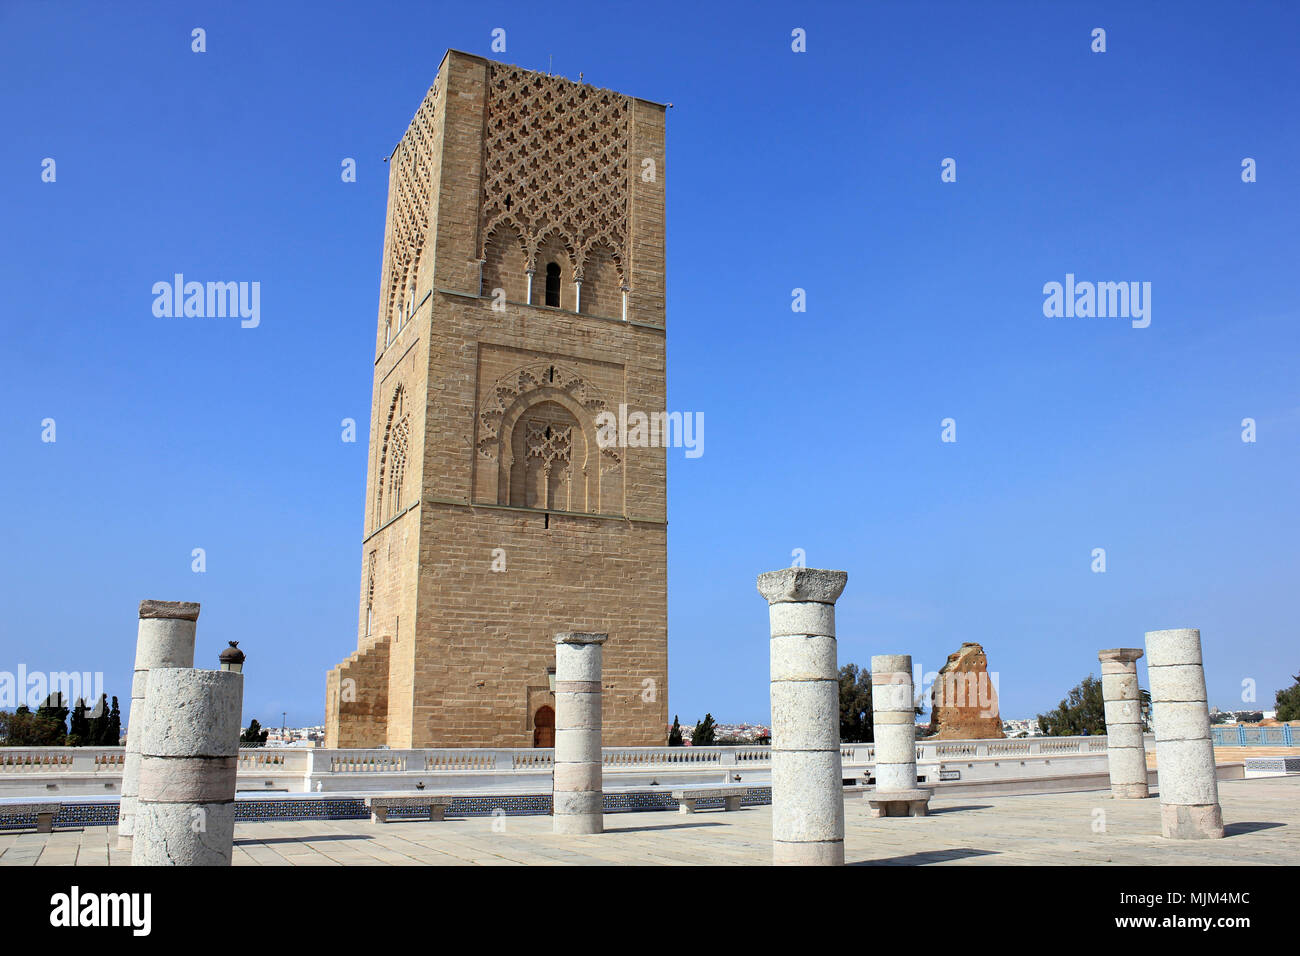 Torre Hassan a.k.a. Tour Hassan Rabat, Marocco Immagini Stock